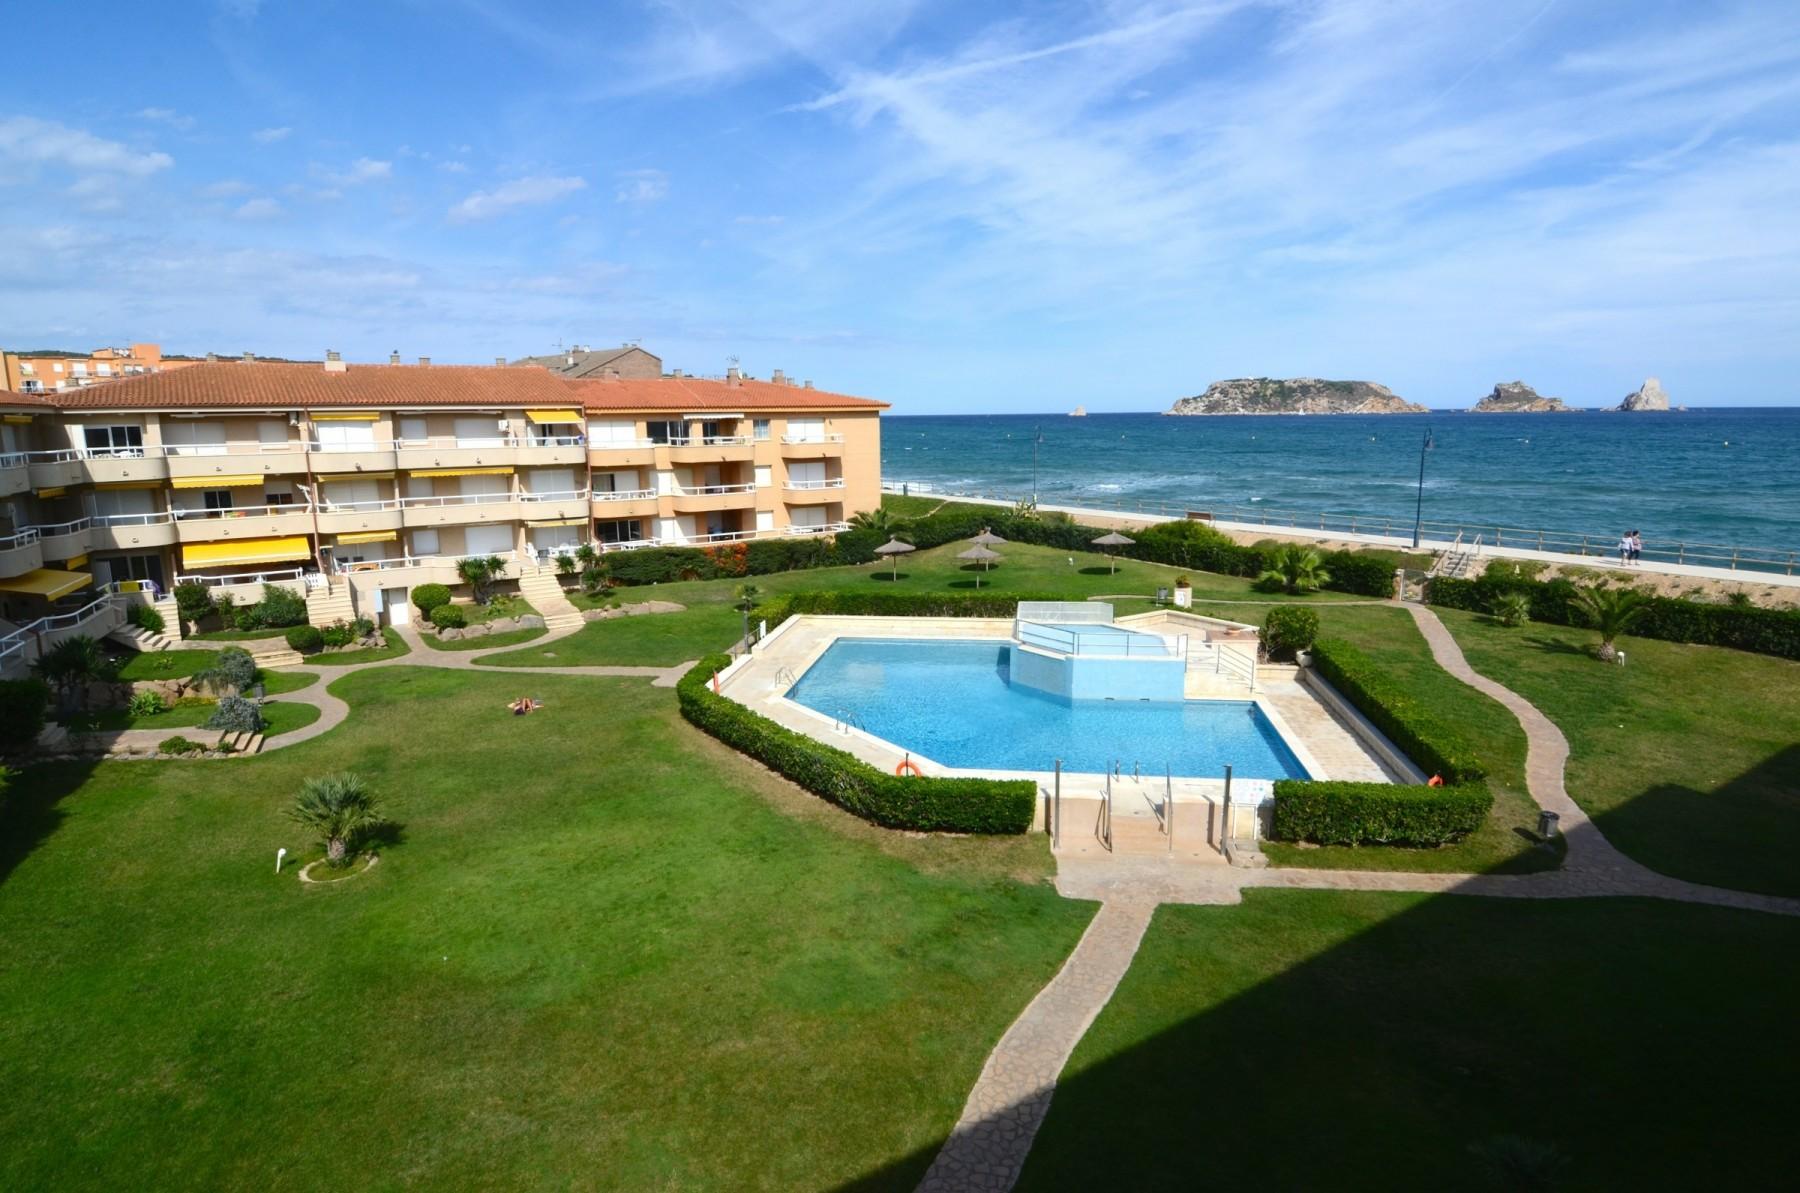 ARGONAVIS 119 for 4 guests in L Estartit, Spanien